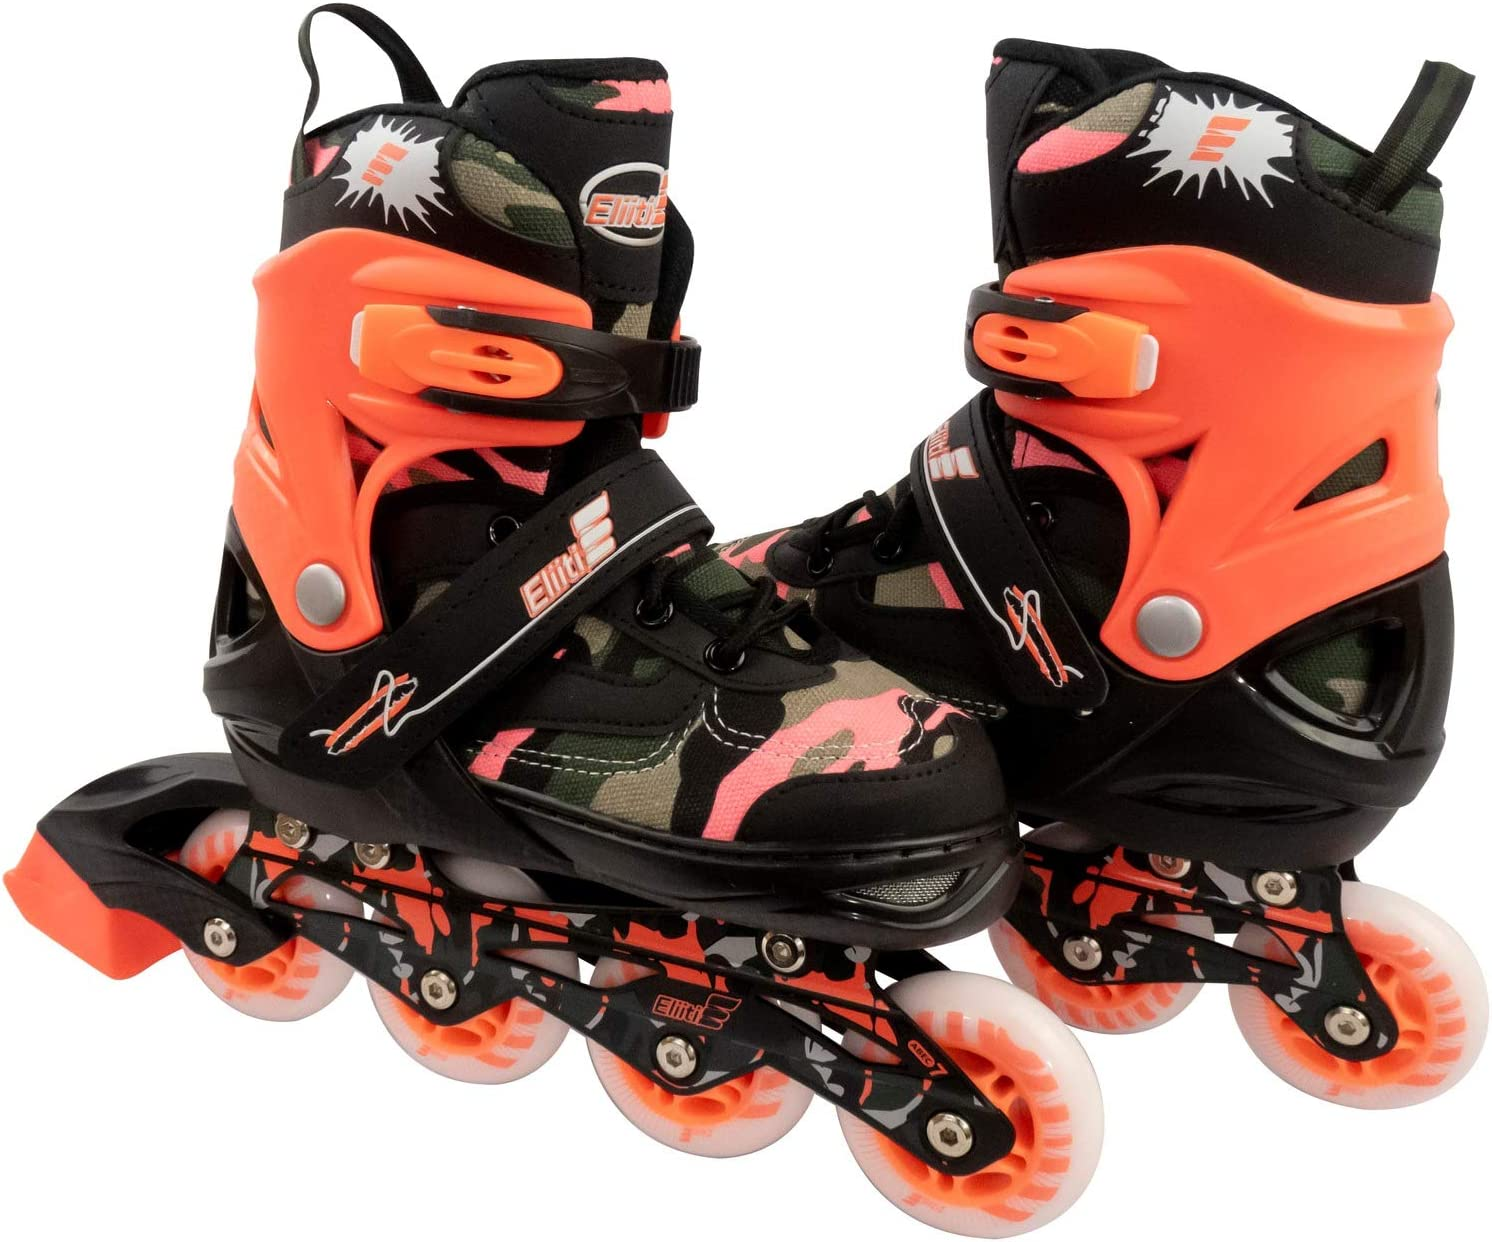 ELIITI Kids Inline Skates for Girls Boys Adjustable Size 13J to 9